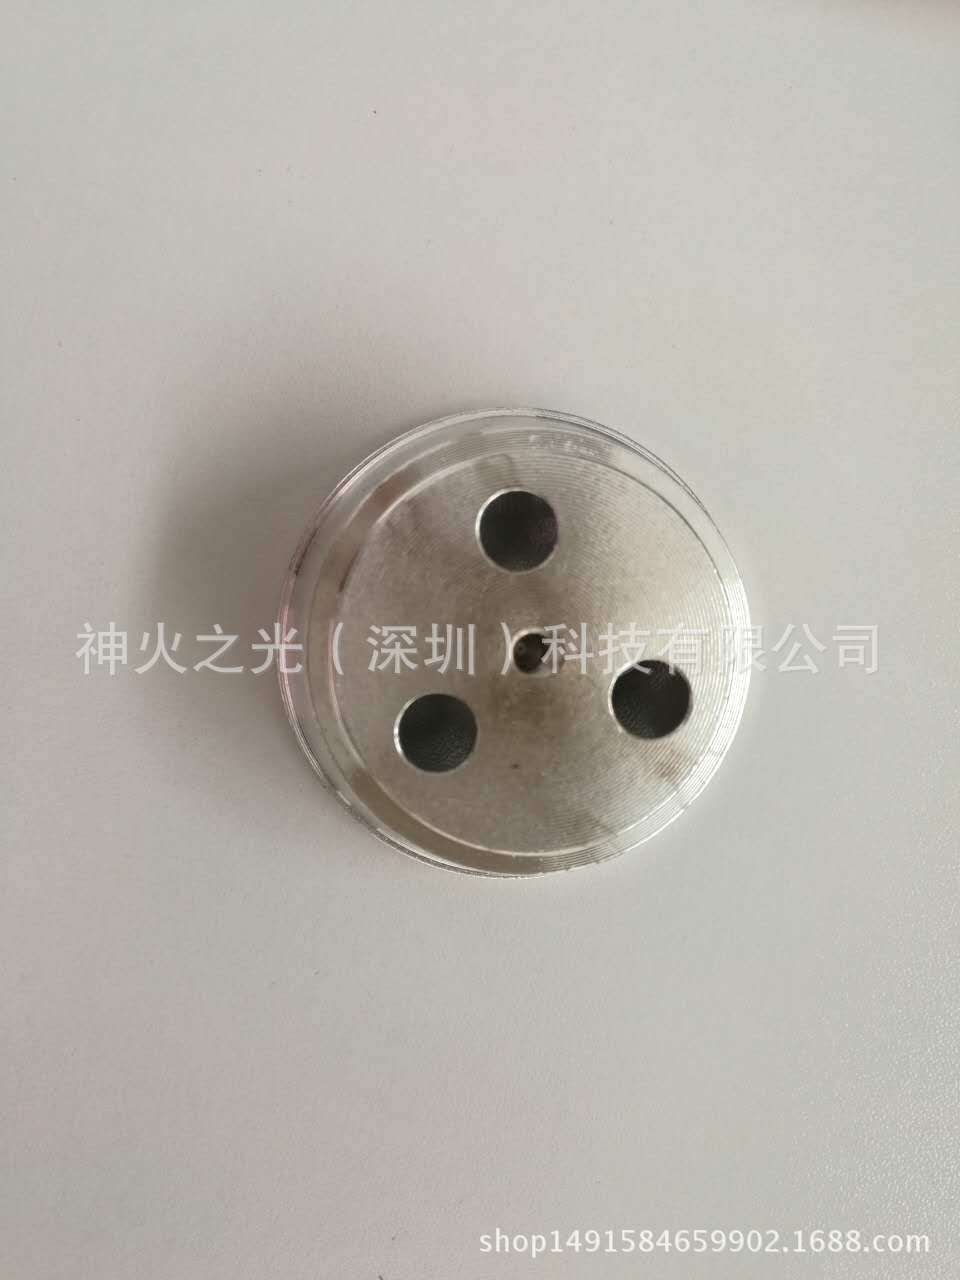 T6 反光杯(51*18*7)手电筒  CNC 加工 投光灯外壳 铝杯 灯杯